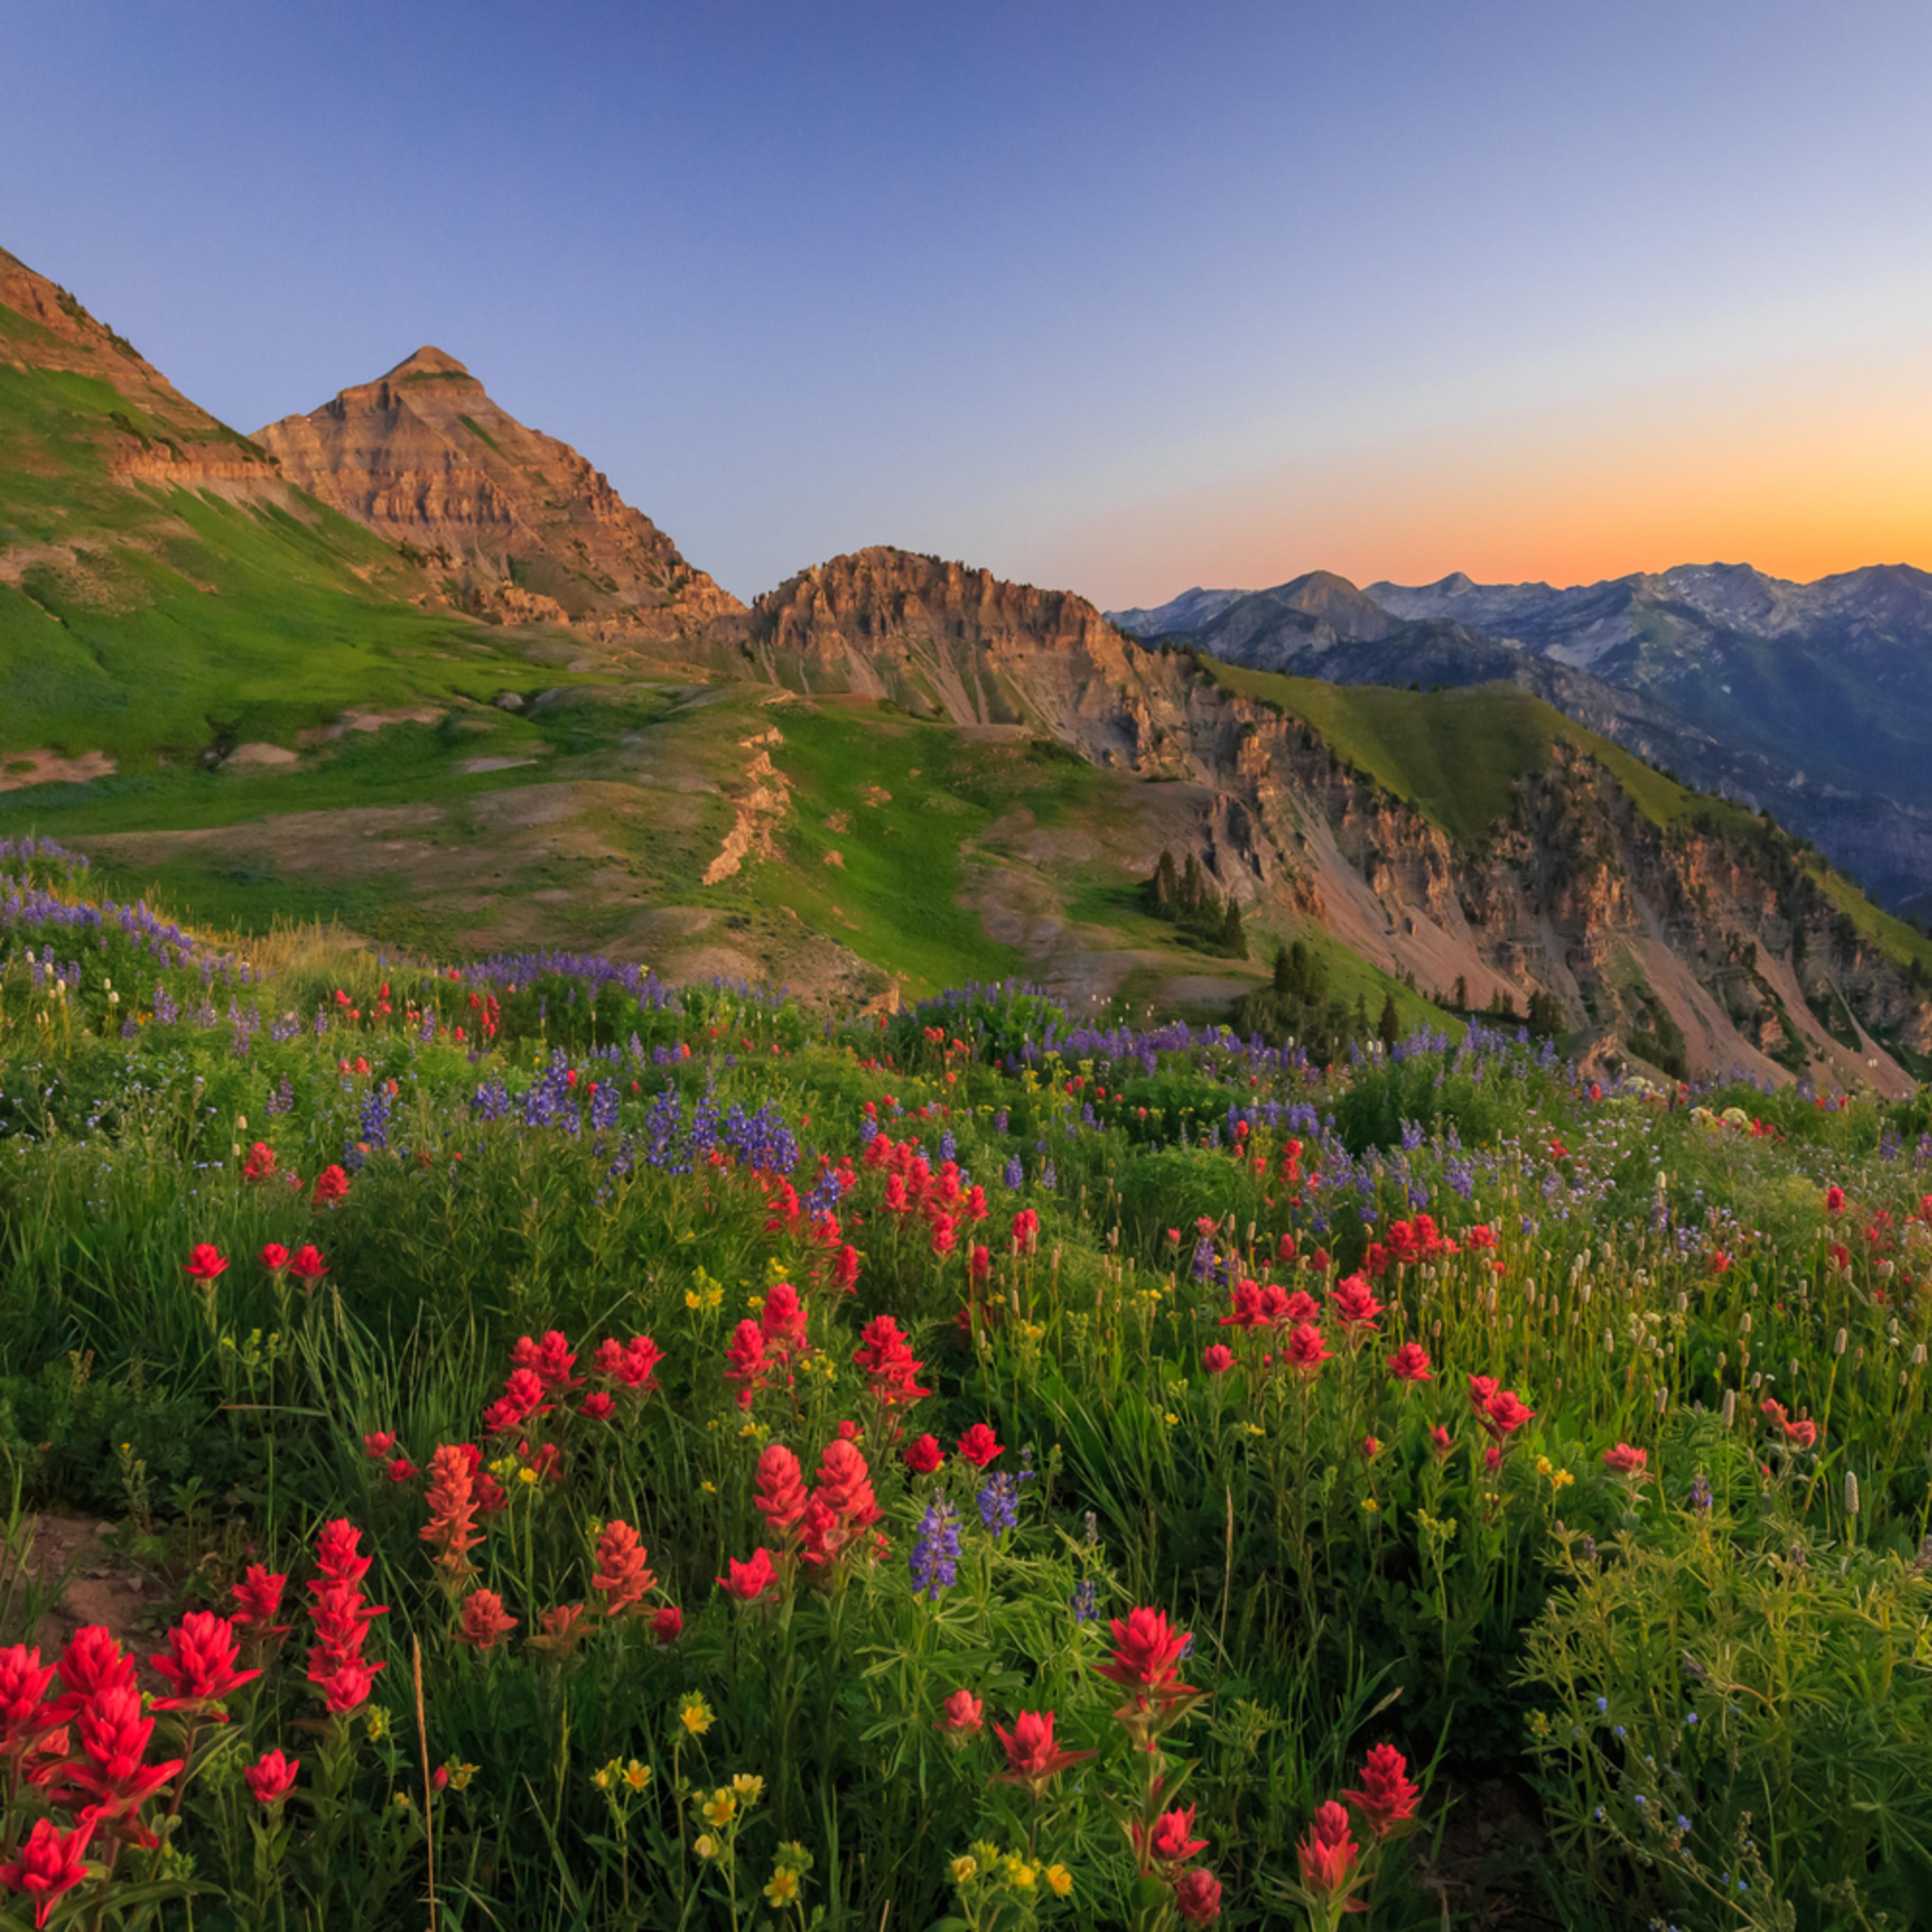 Wasatch wildflowers in dawn light f69kf0